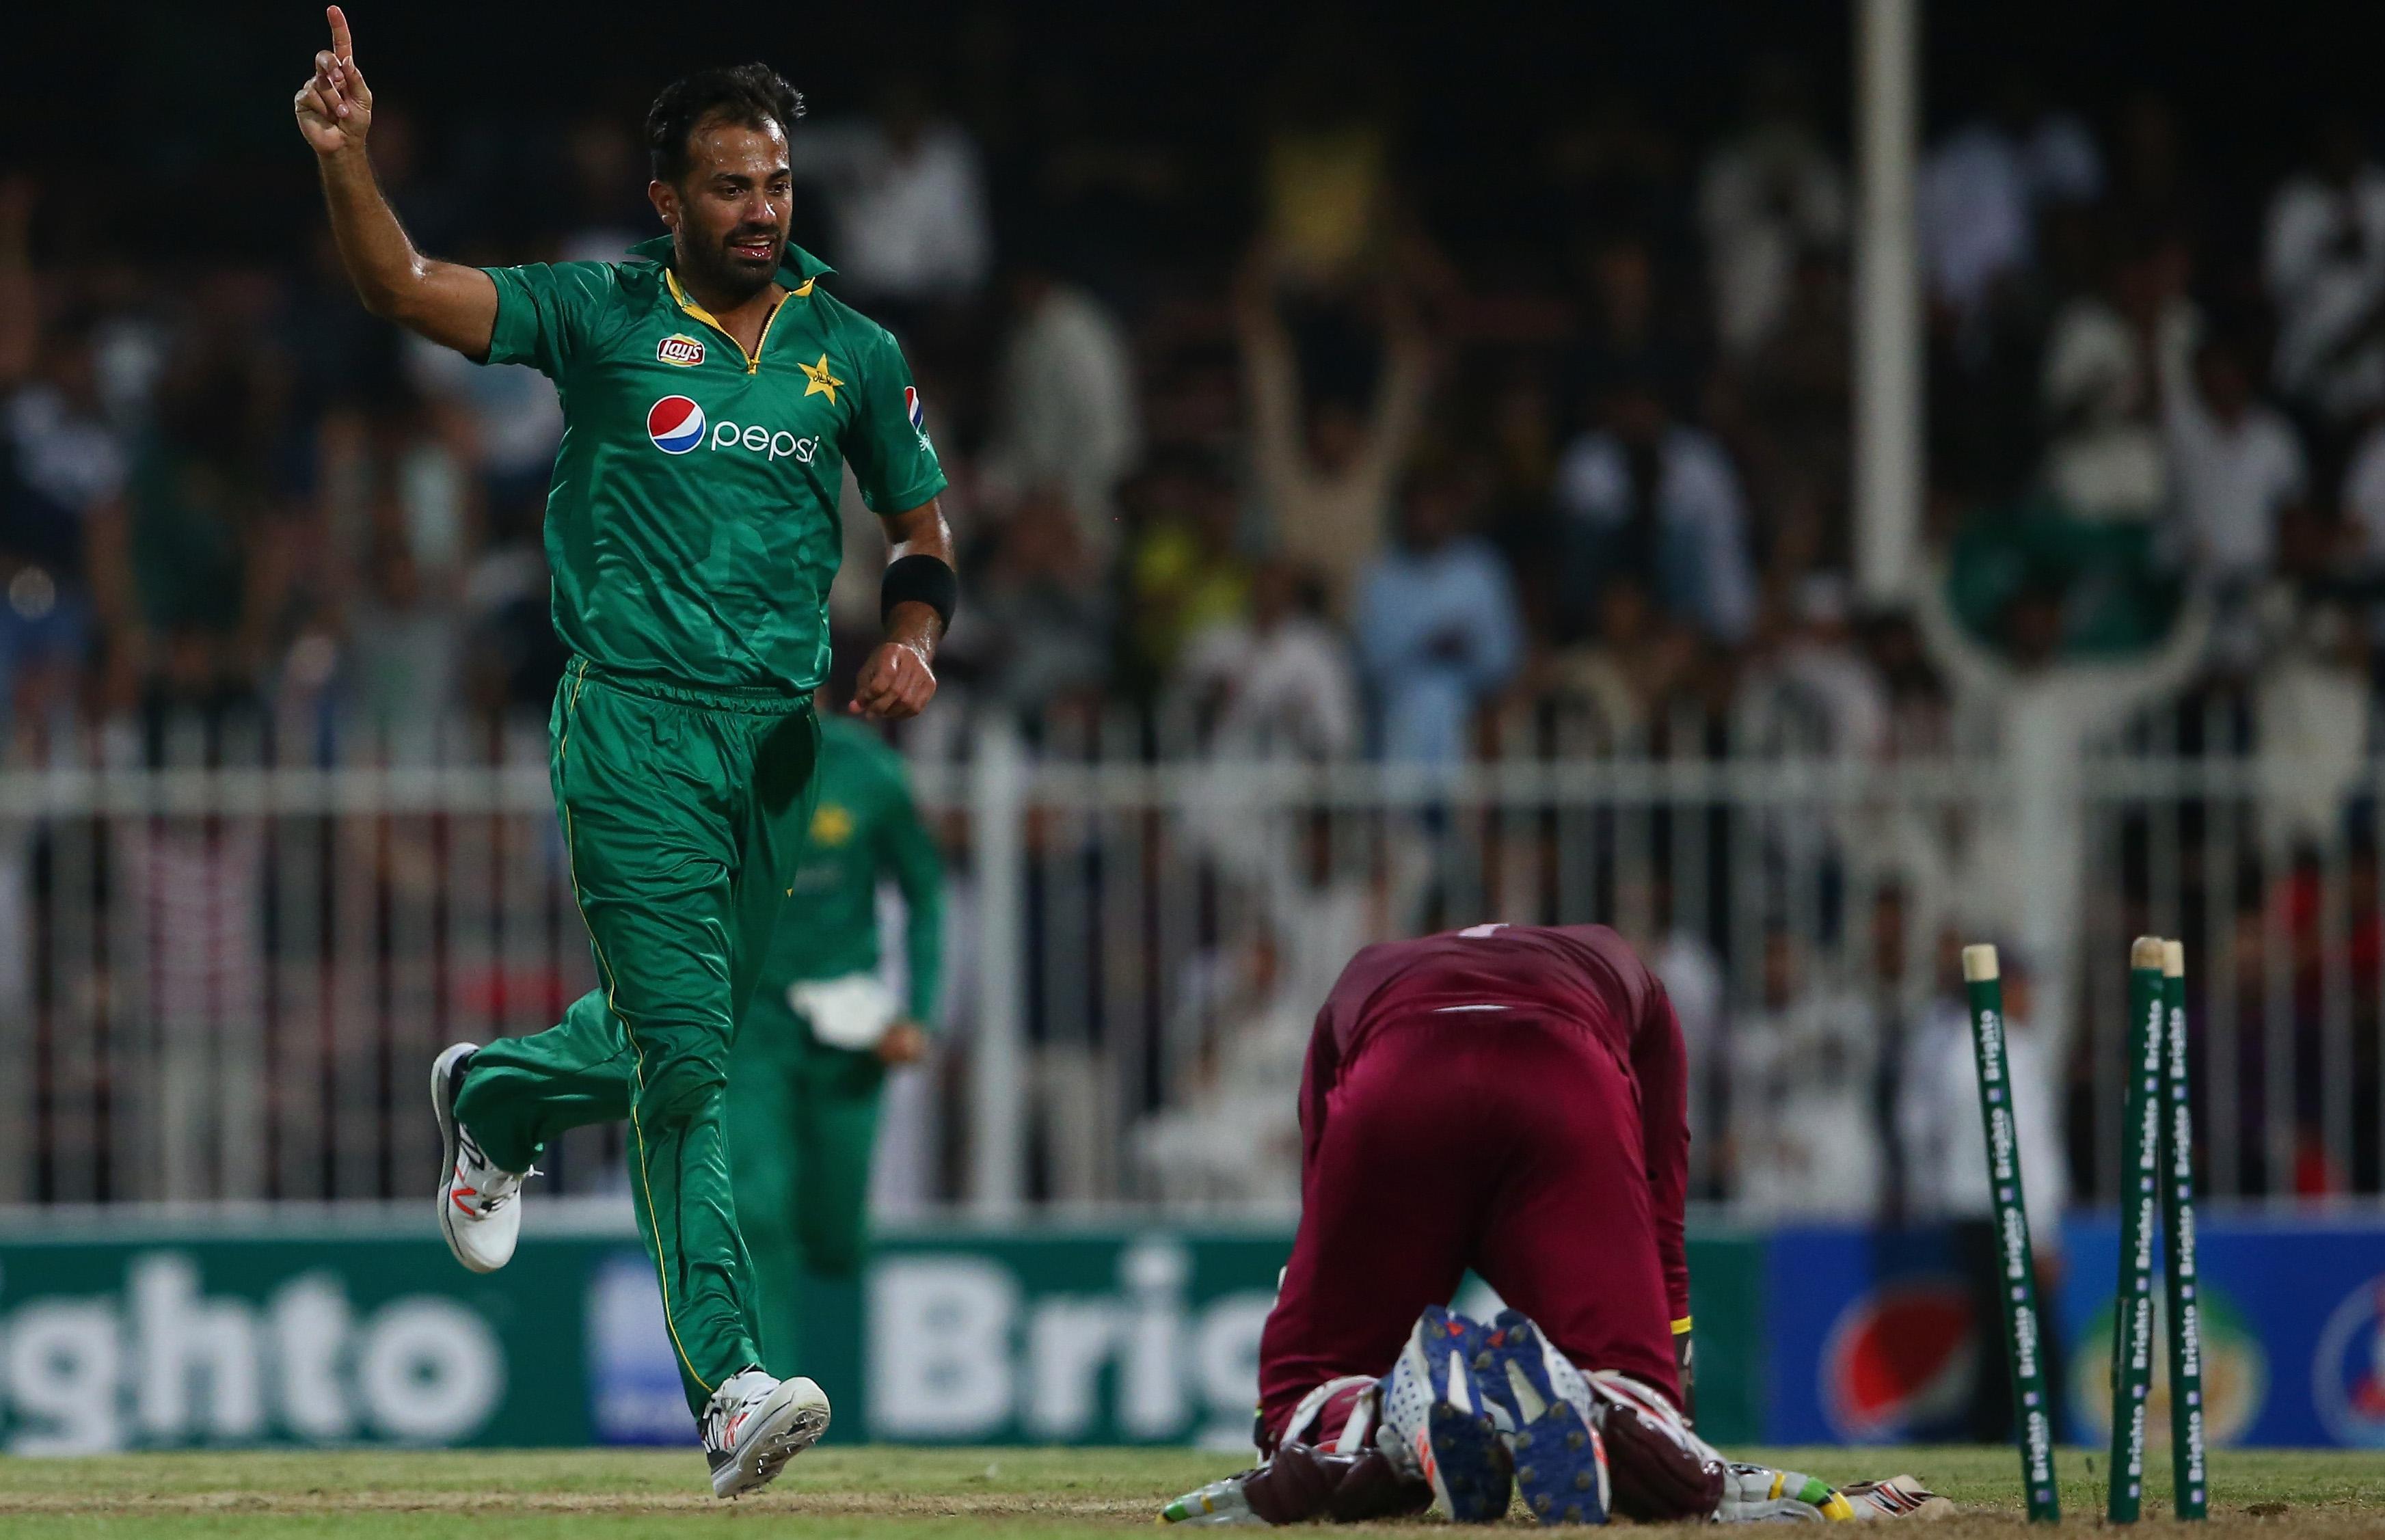 Pakistan vs. West Indies cricket, live stream cricket, Cricket World Cup qualification, West Indies tour, ICC ODI world rankings, 2nd ODI